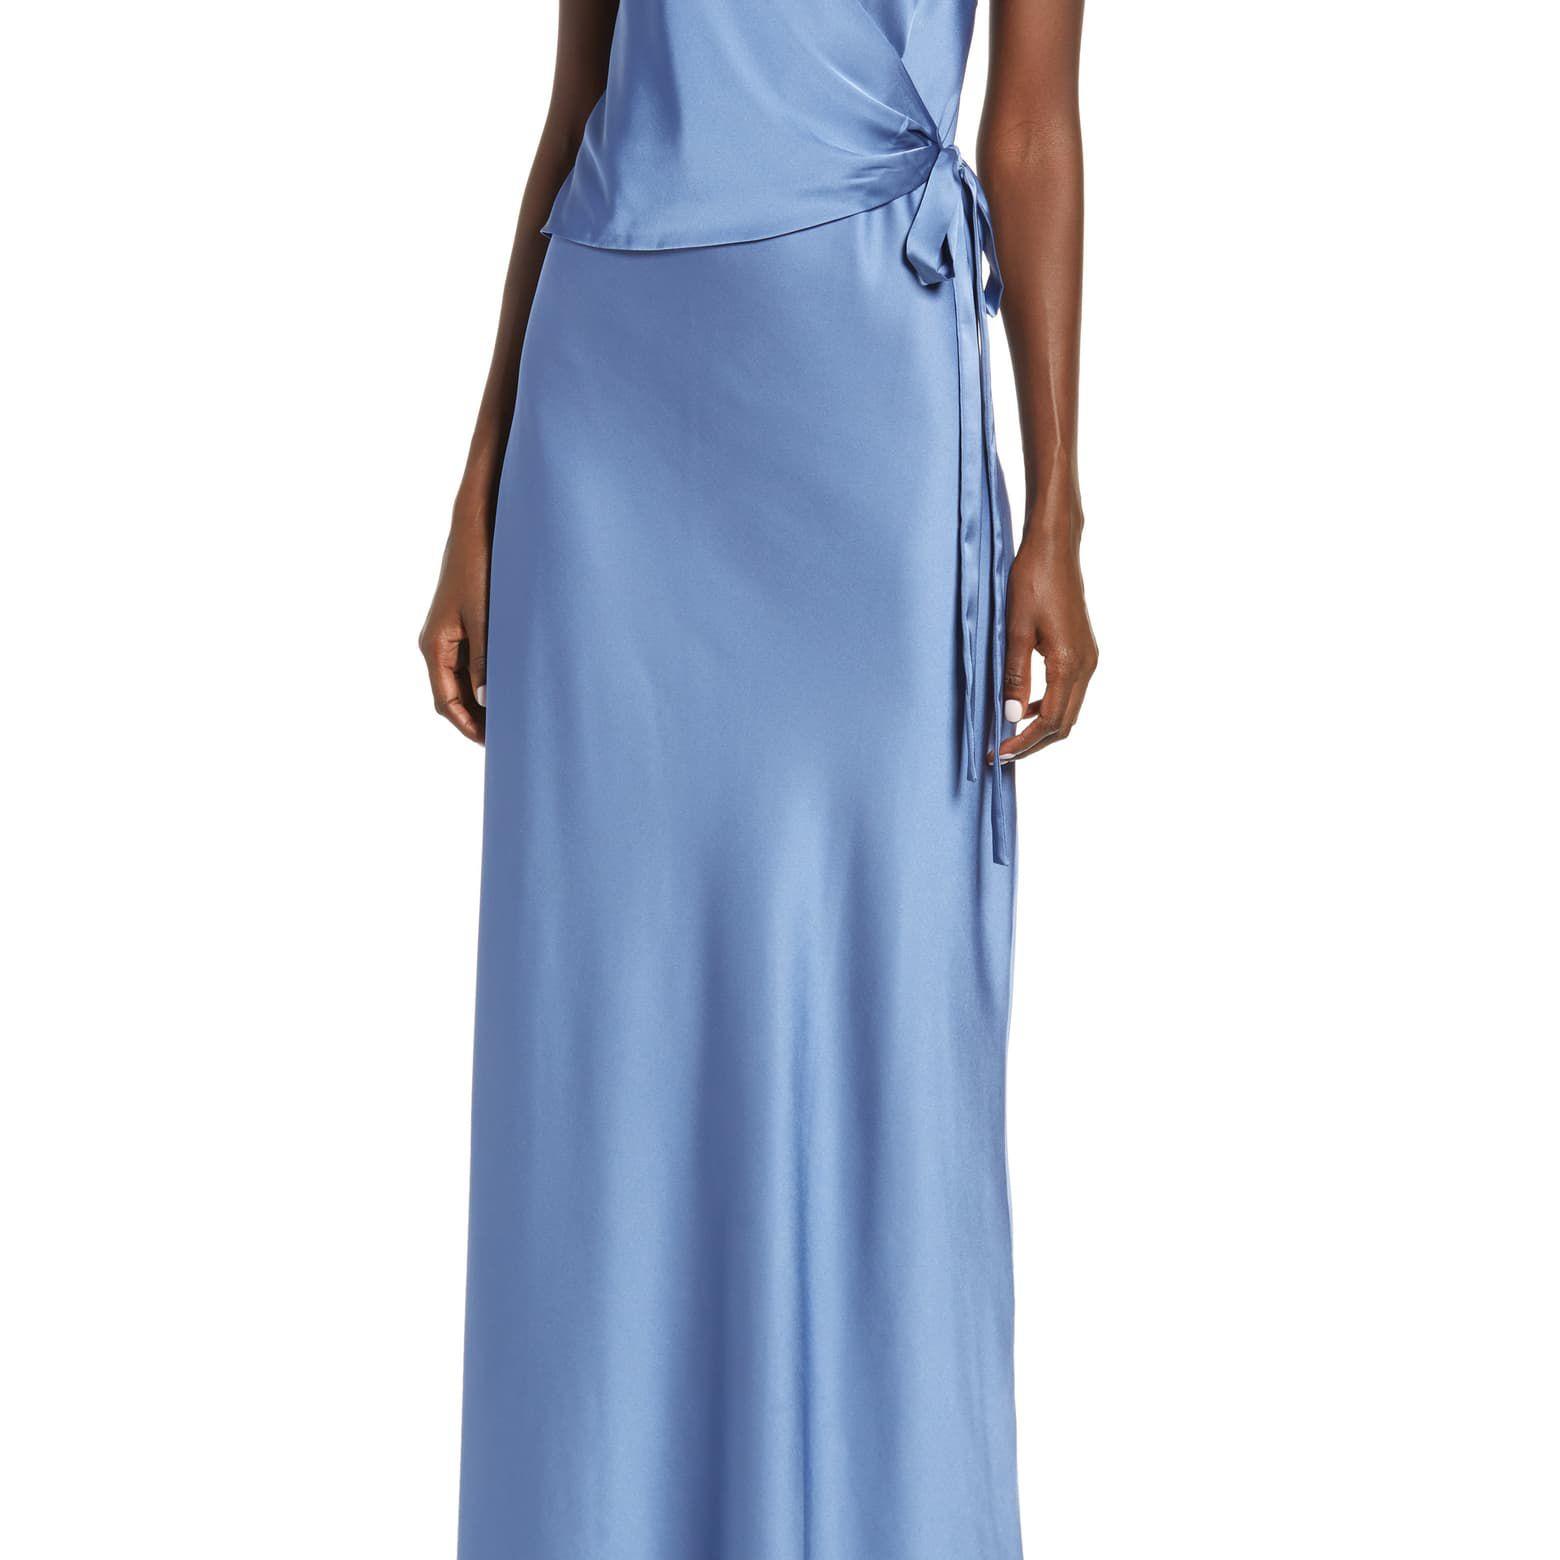 Wayf The Bea Faux Wrap V-Neck Dress $138